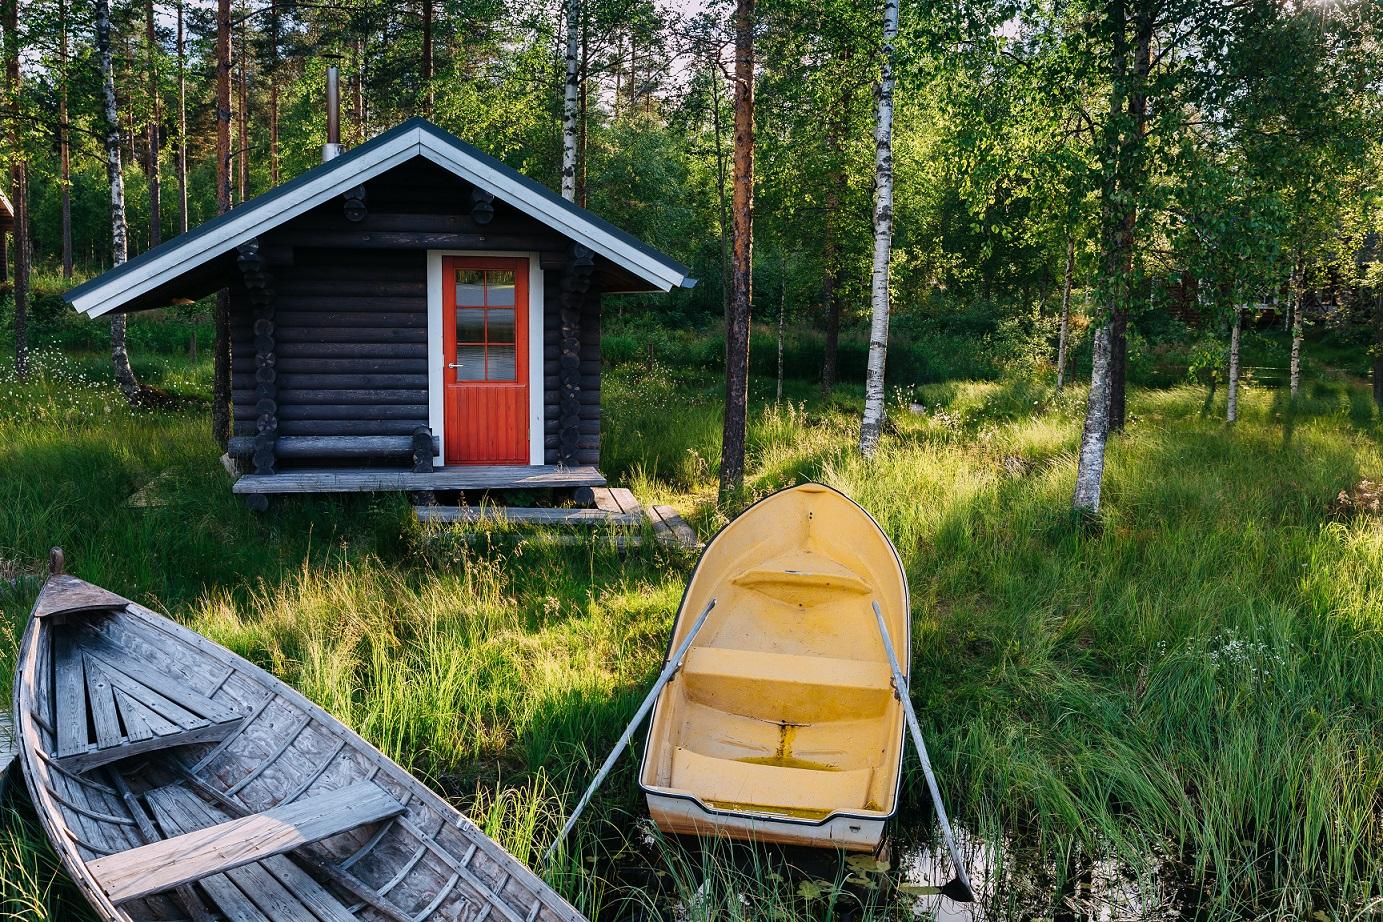 Gartenhaus am See in skandinavien